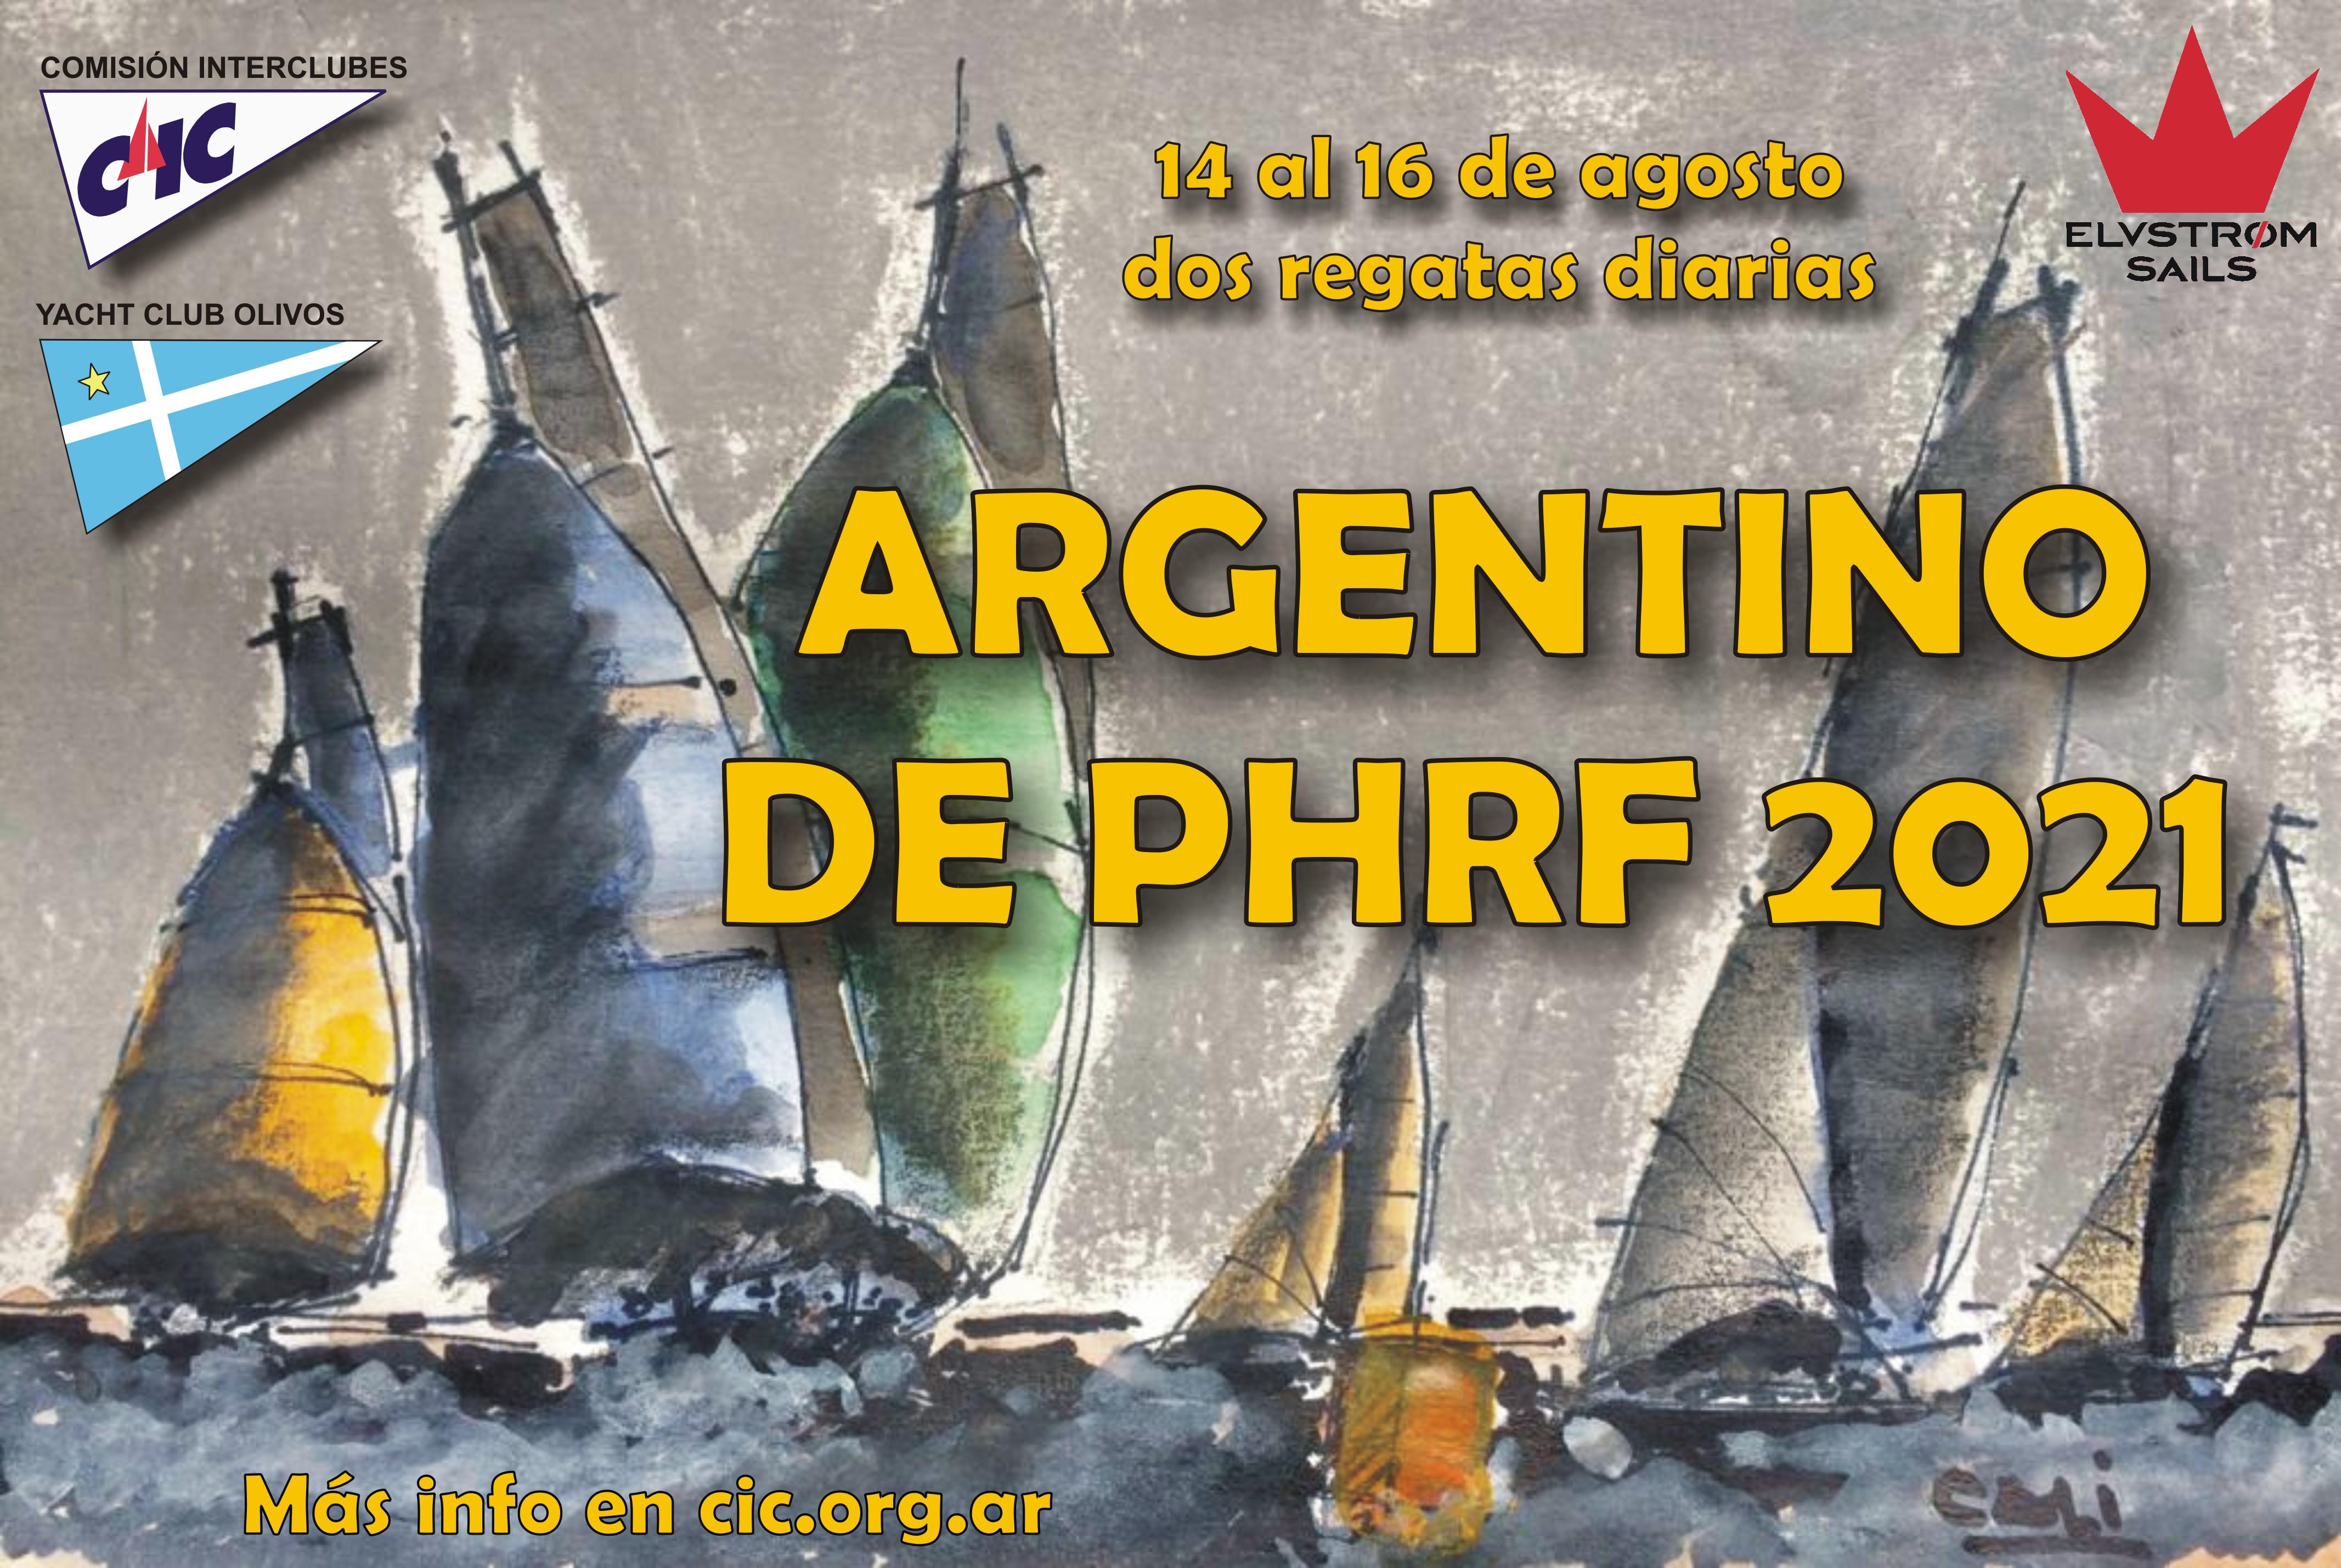 Argentino PHRF 2021